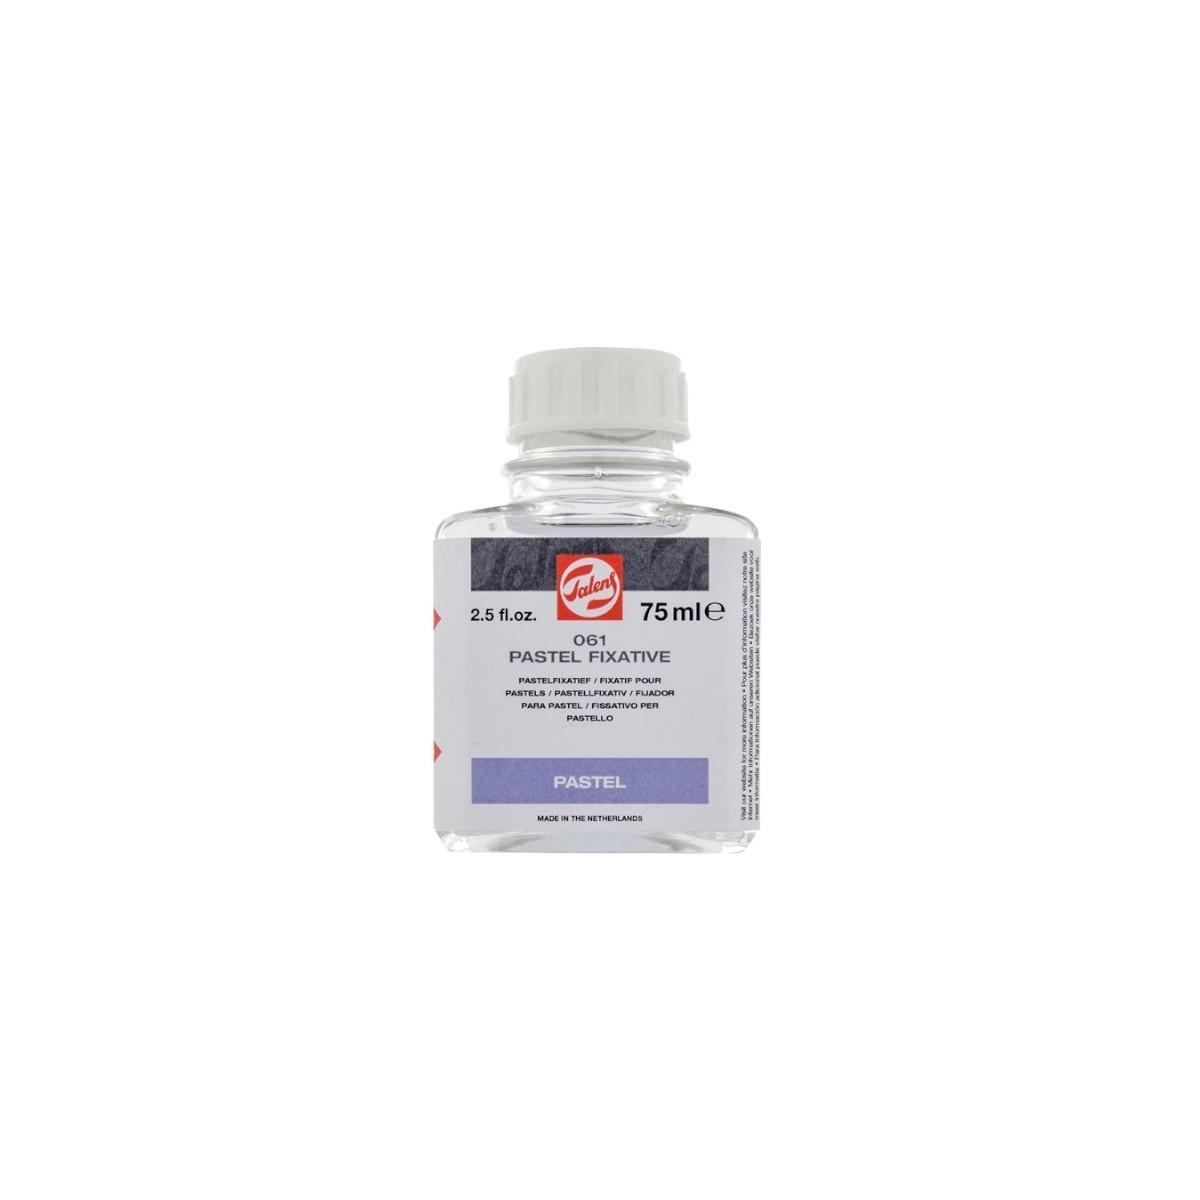 Talens, 061 Pastel fixative, 75 ml